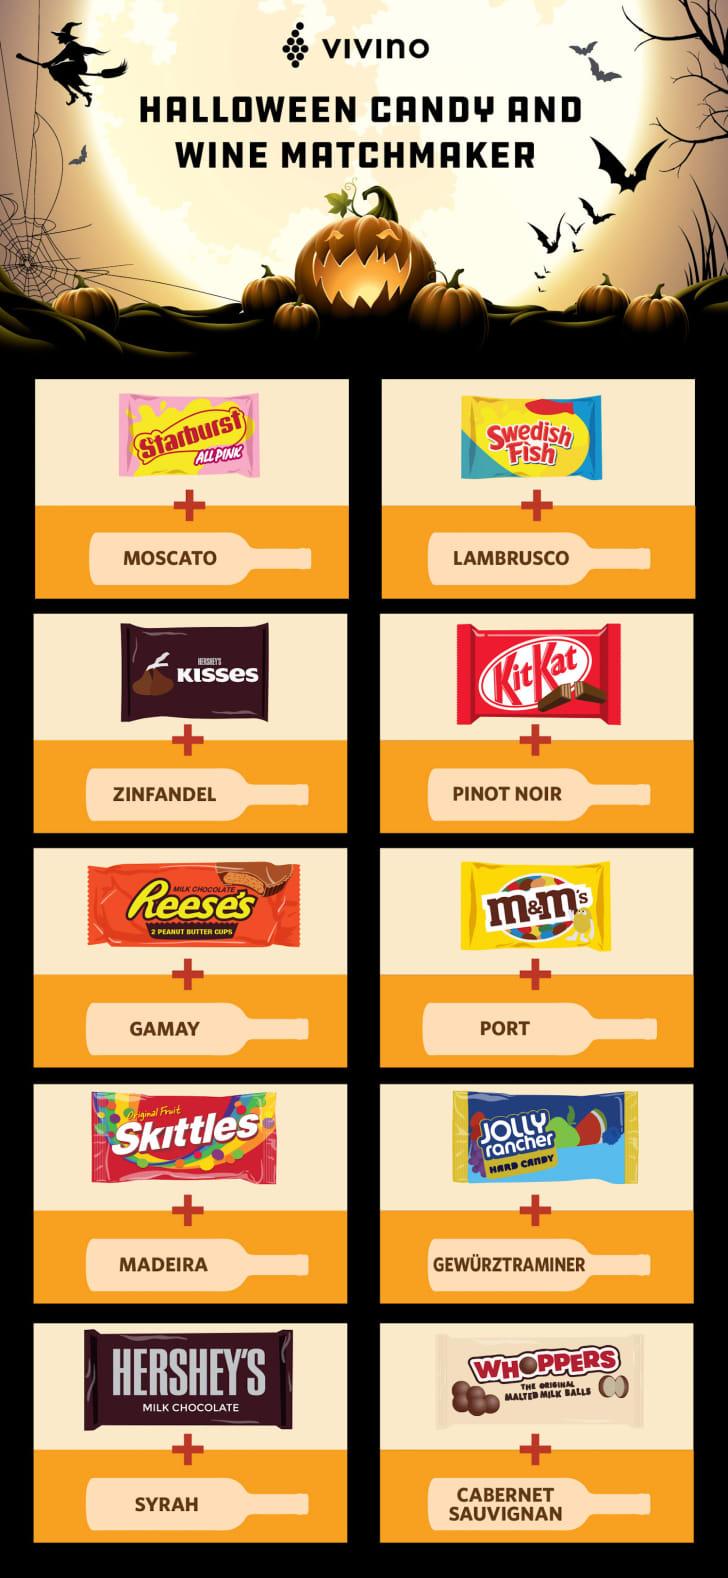 Vivino's wine and Halloween candy pairing infographic